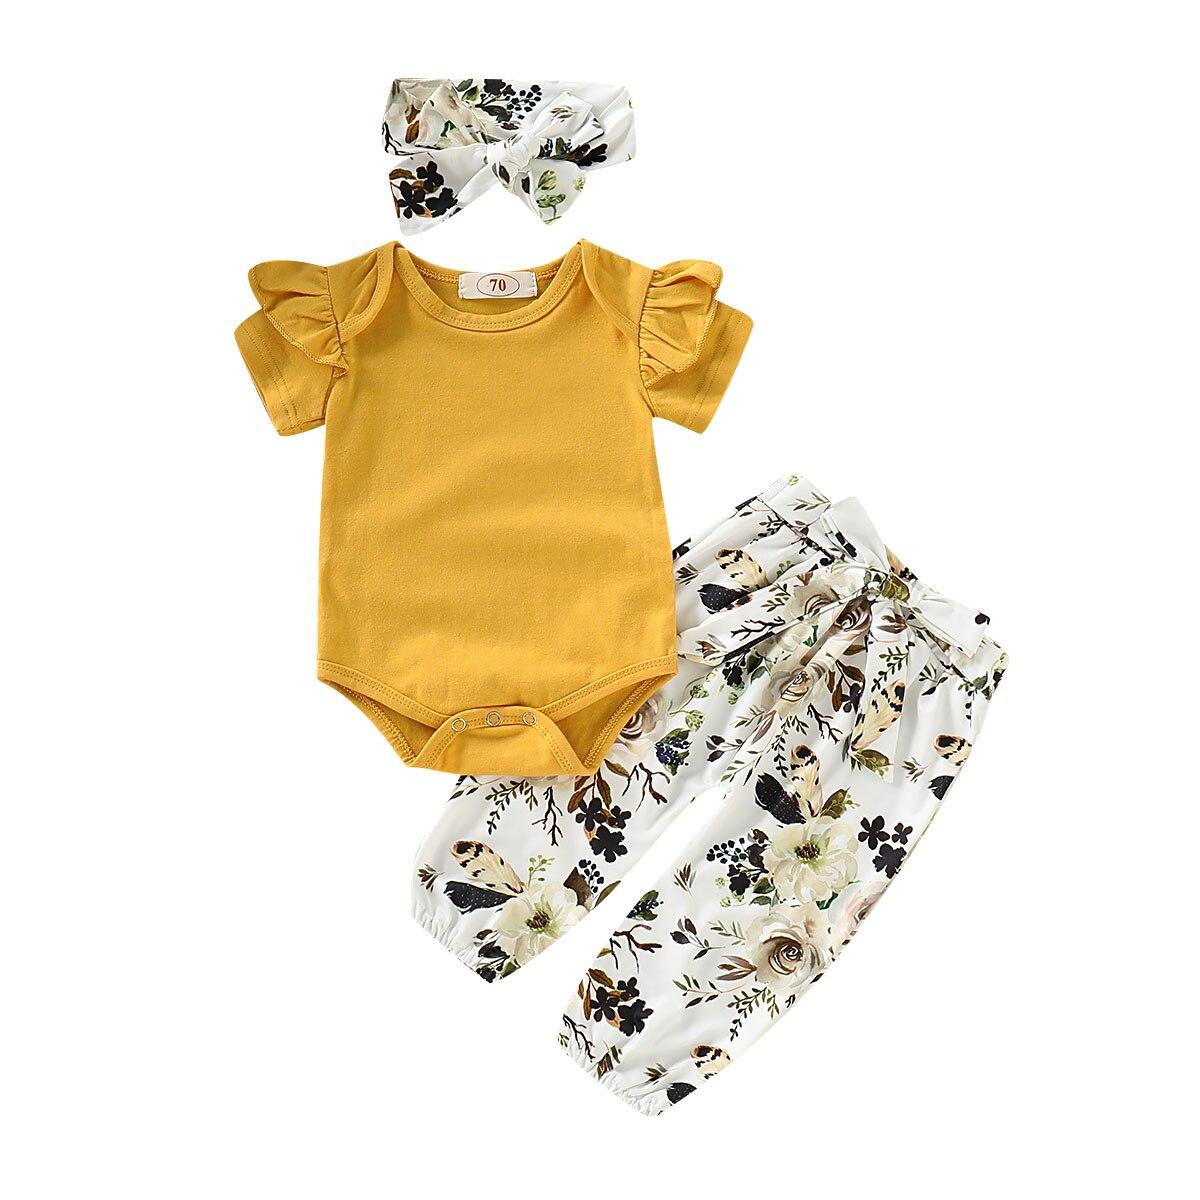 2020 0-2Y Autumn Infant Kids Baby Girl Clothes Sets Sister Long Sleeve Letter Tops Bodysuit+Leggings Pants Outfits 4pcs